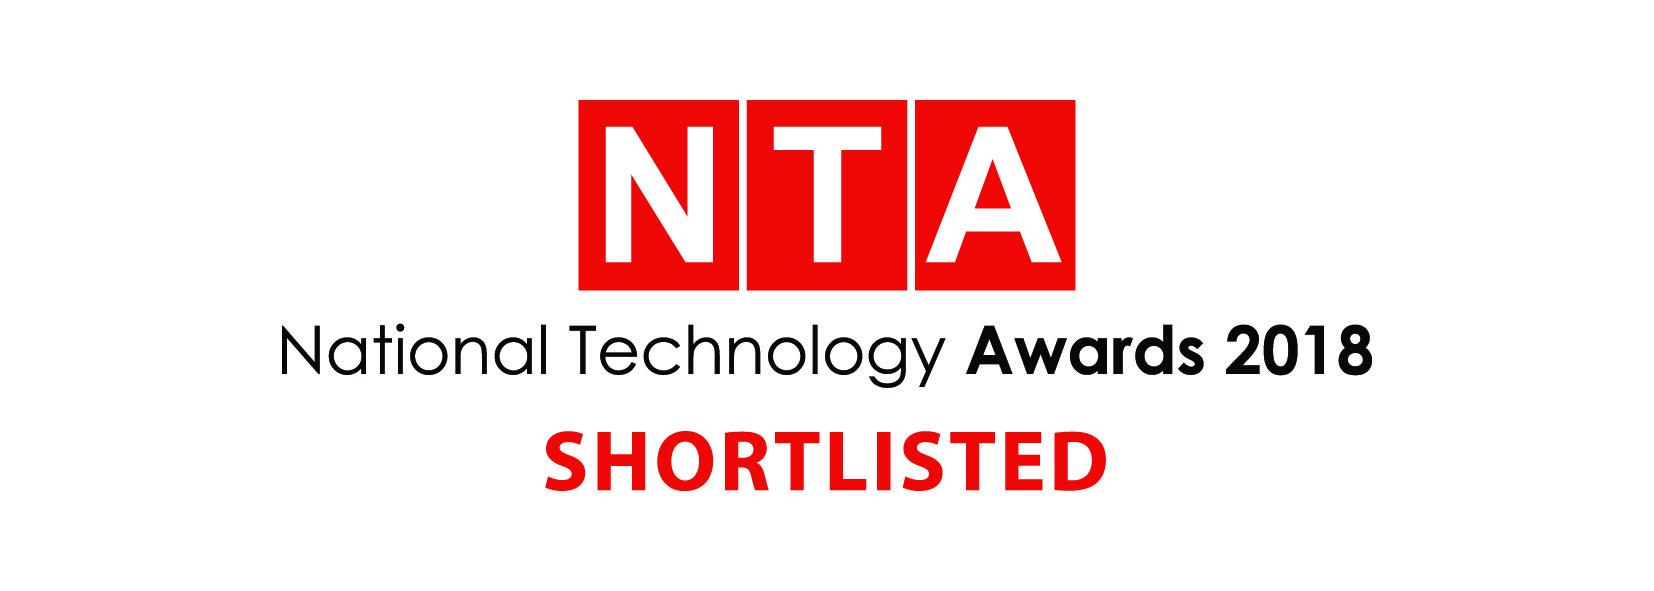 National Technology Awards